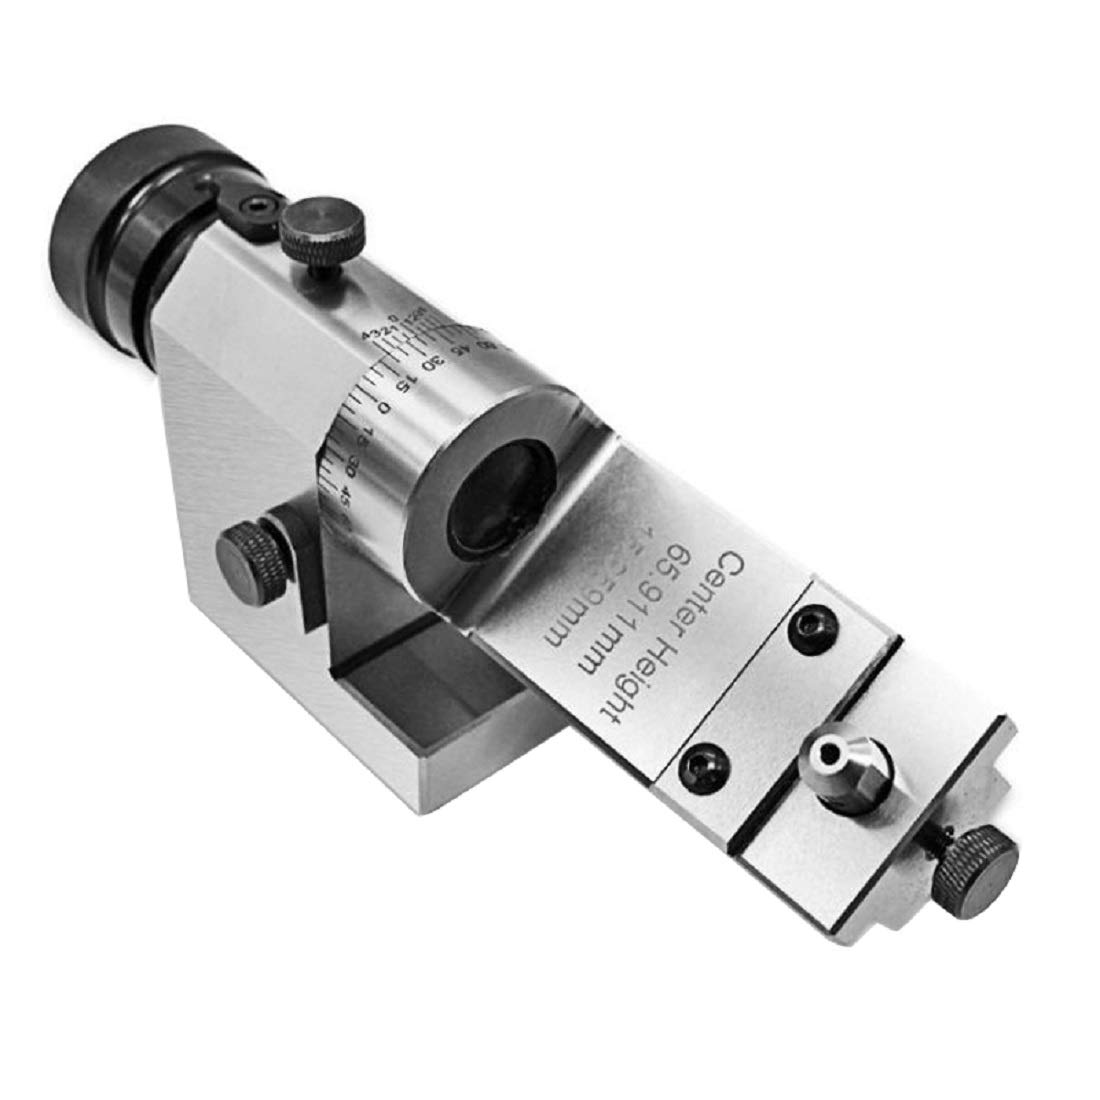 Perspective Grinding Wheel Dresser Visual Optical Radius Angle Dresser Value Line Optical Grinding Wheel Radius Angle Dresser by tinsay (Image #8)